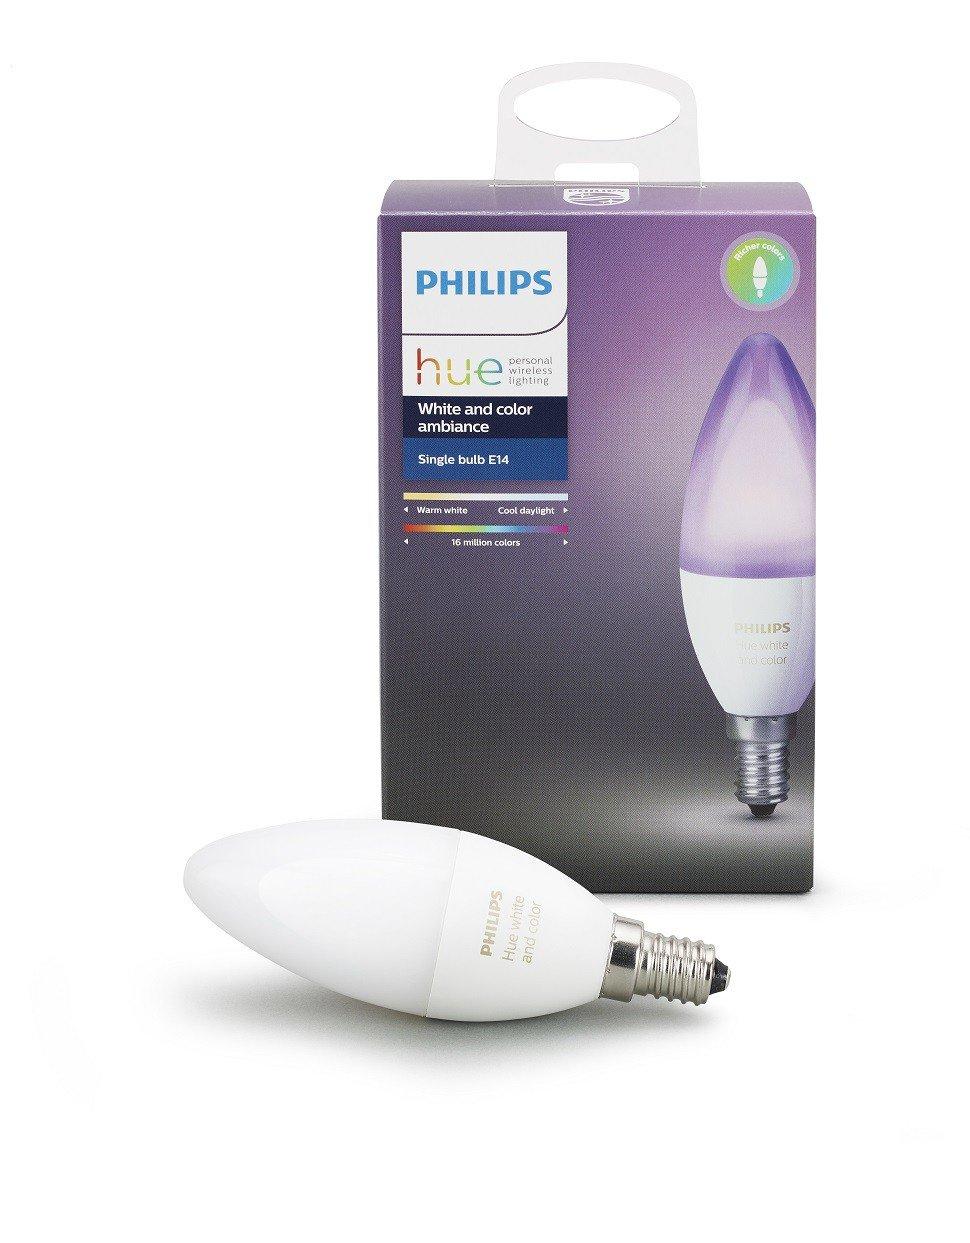 Philips Hue - Single Bulb E14 Richer Color - Bluetooth